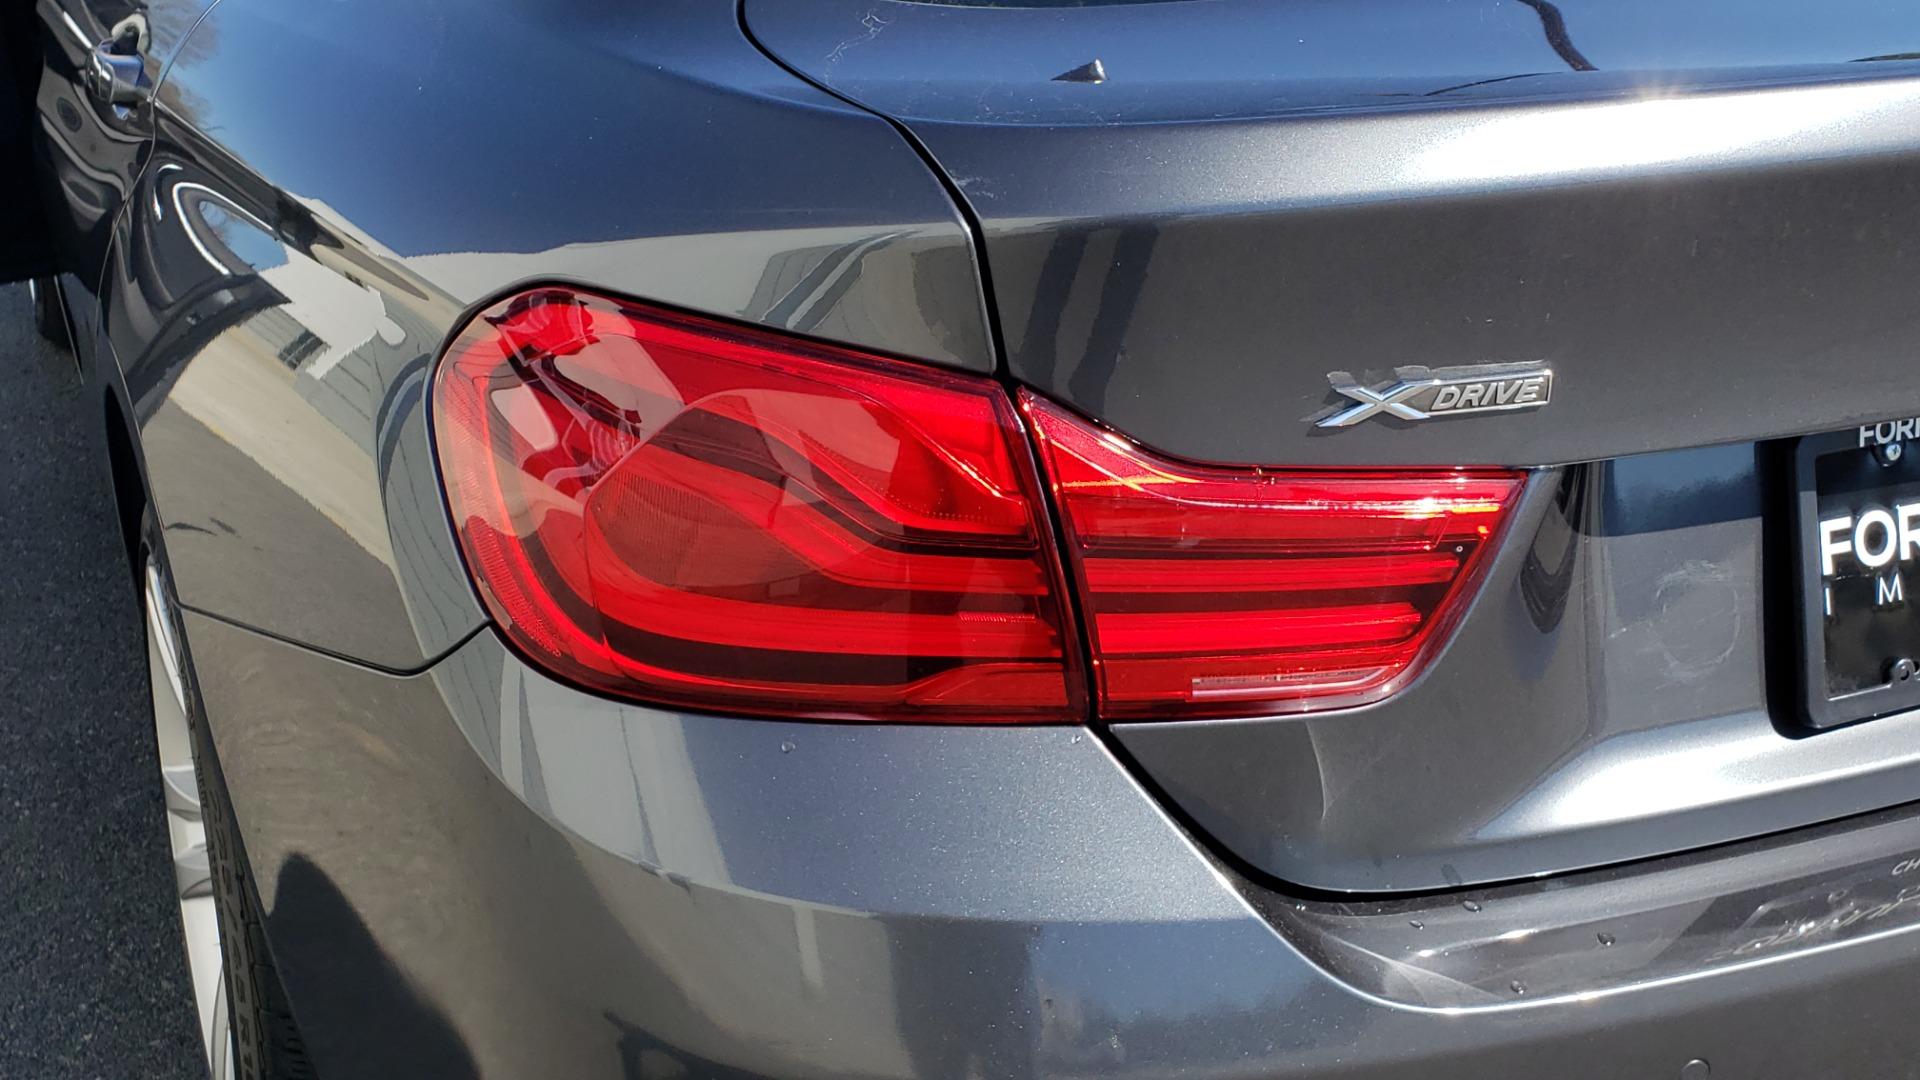 Used 2018 BMW 4 SERIES 430IXDRIVE / PREMIUM / NAV / SUNROOF / ESSENTIALS PKG for sale $29,495 at Formula Imports in Charlotte NC 28227 23